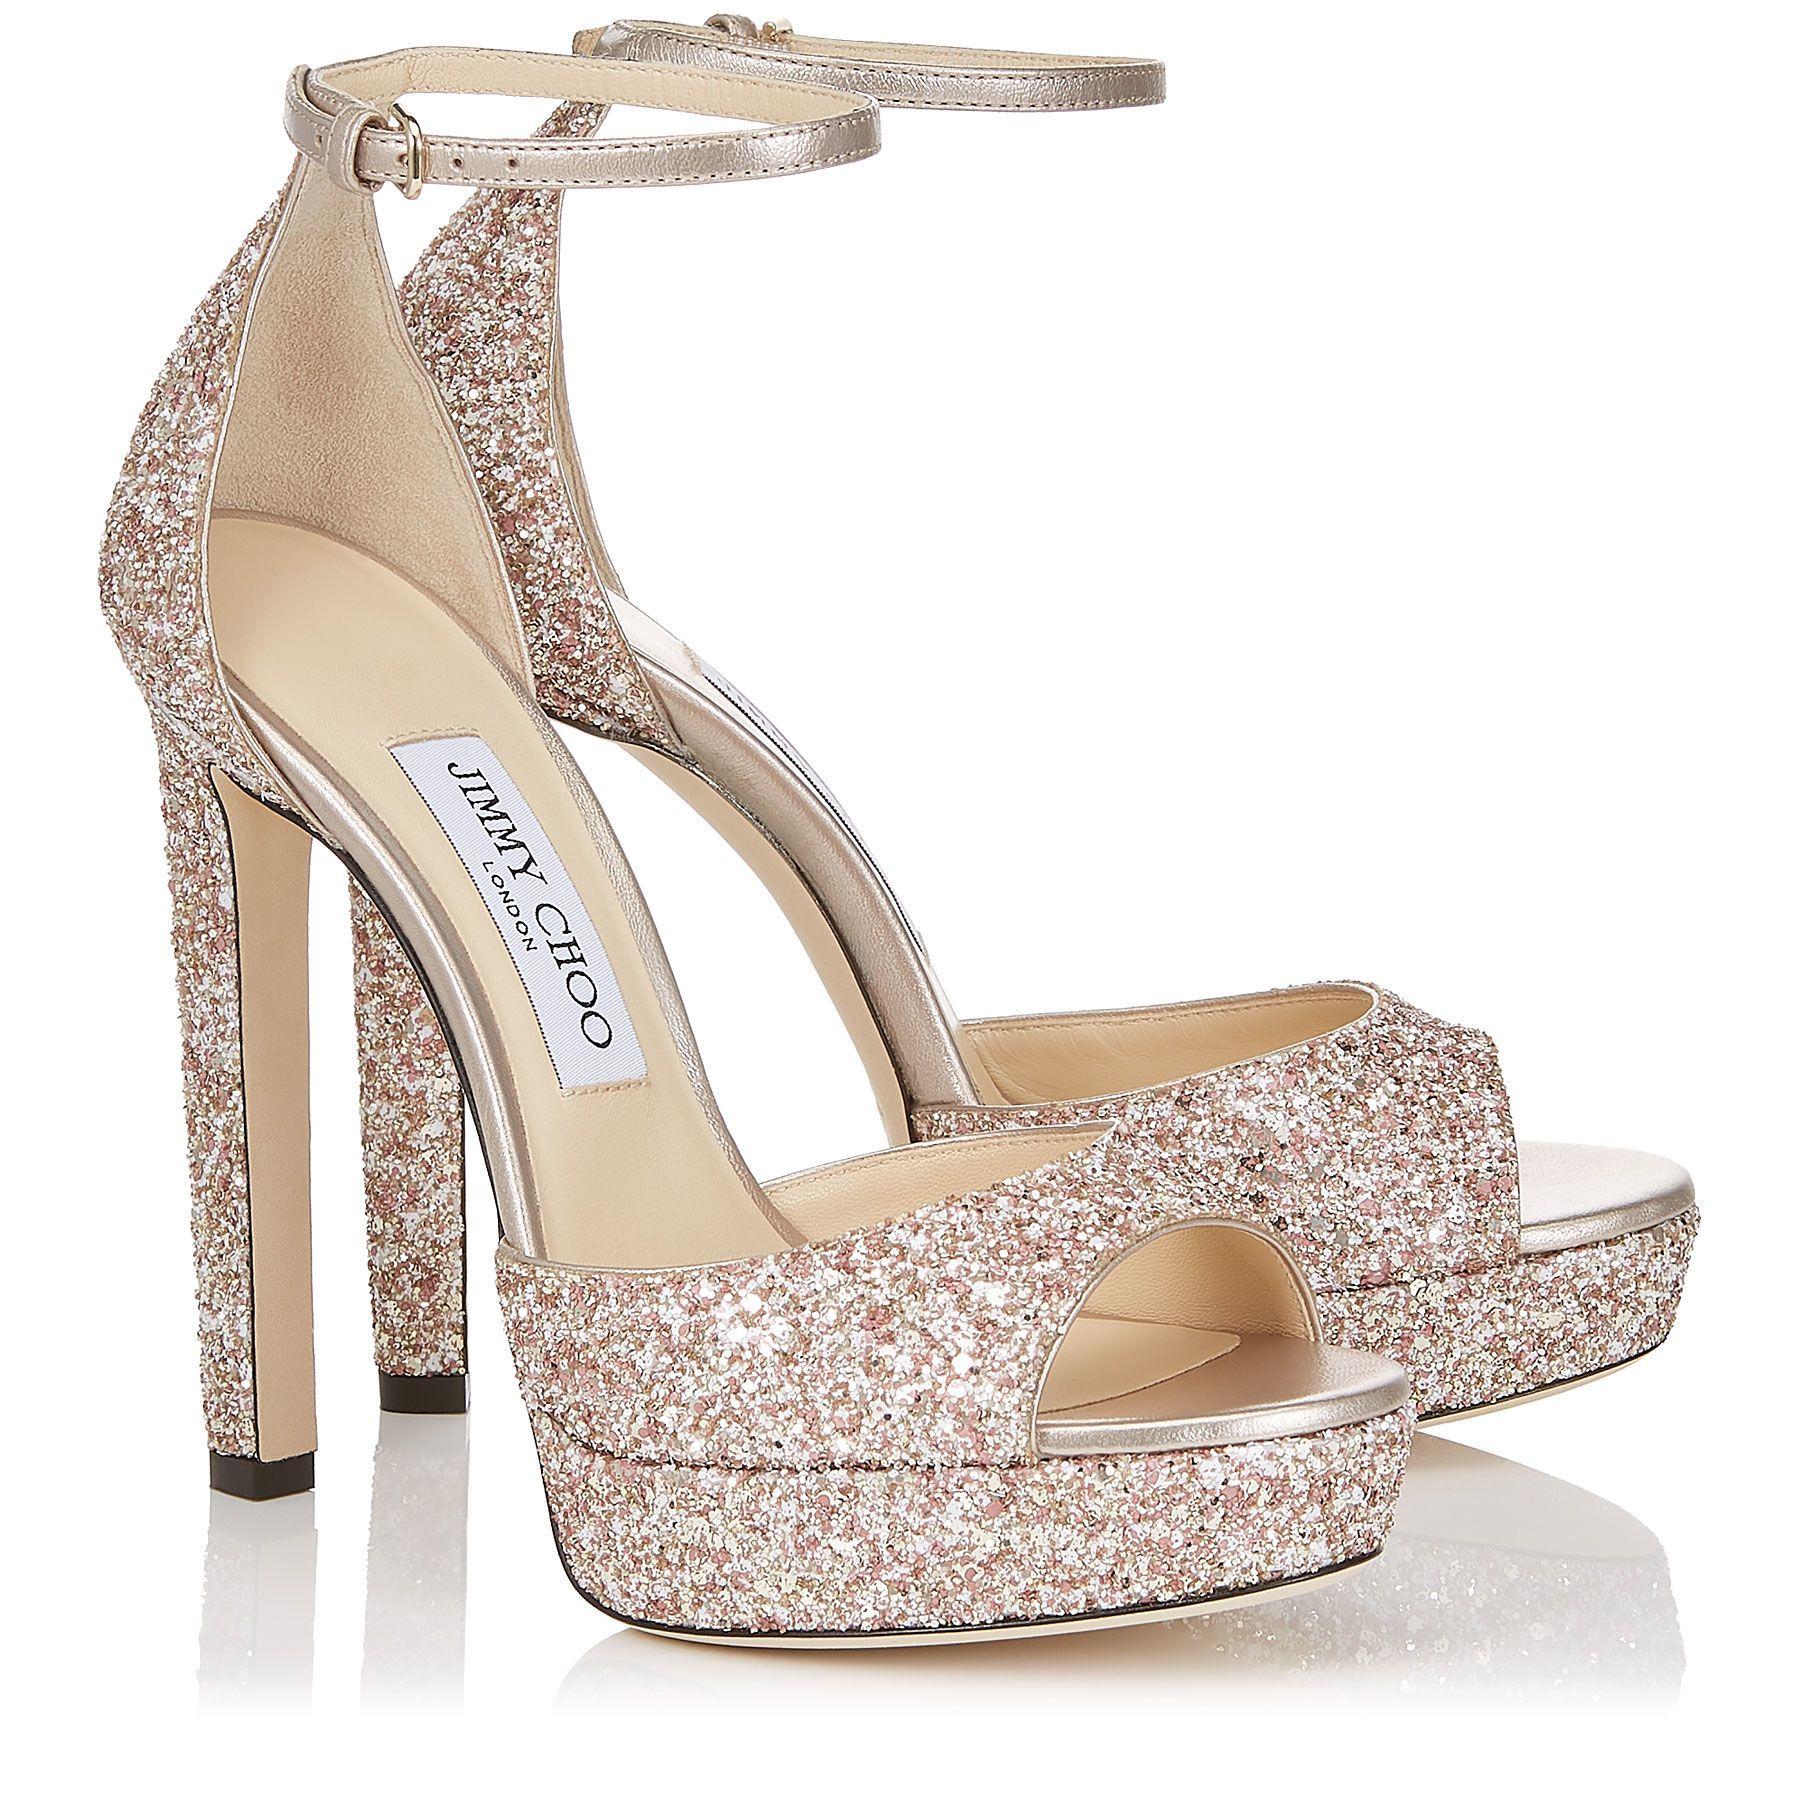 643968e063e0 Jimmy Choo Bridal Collection   Jimmy Choo   Shoes, Heels, Glitter ...